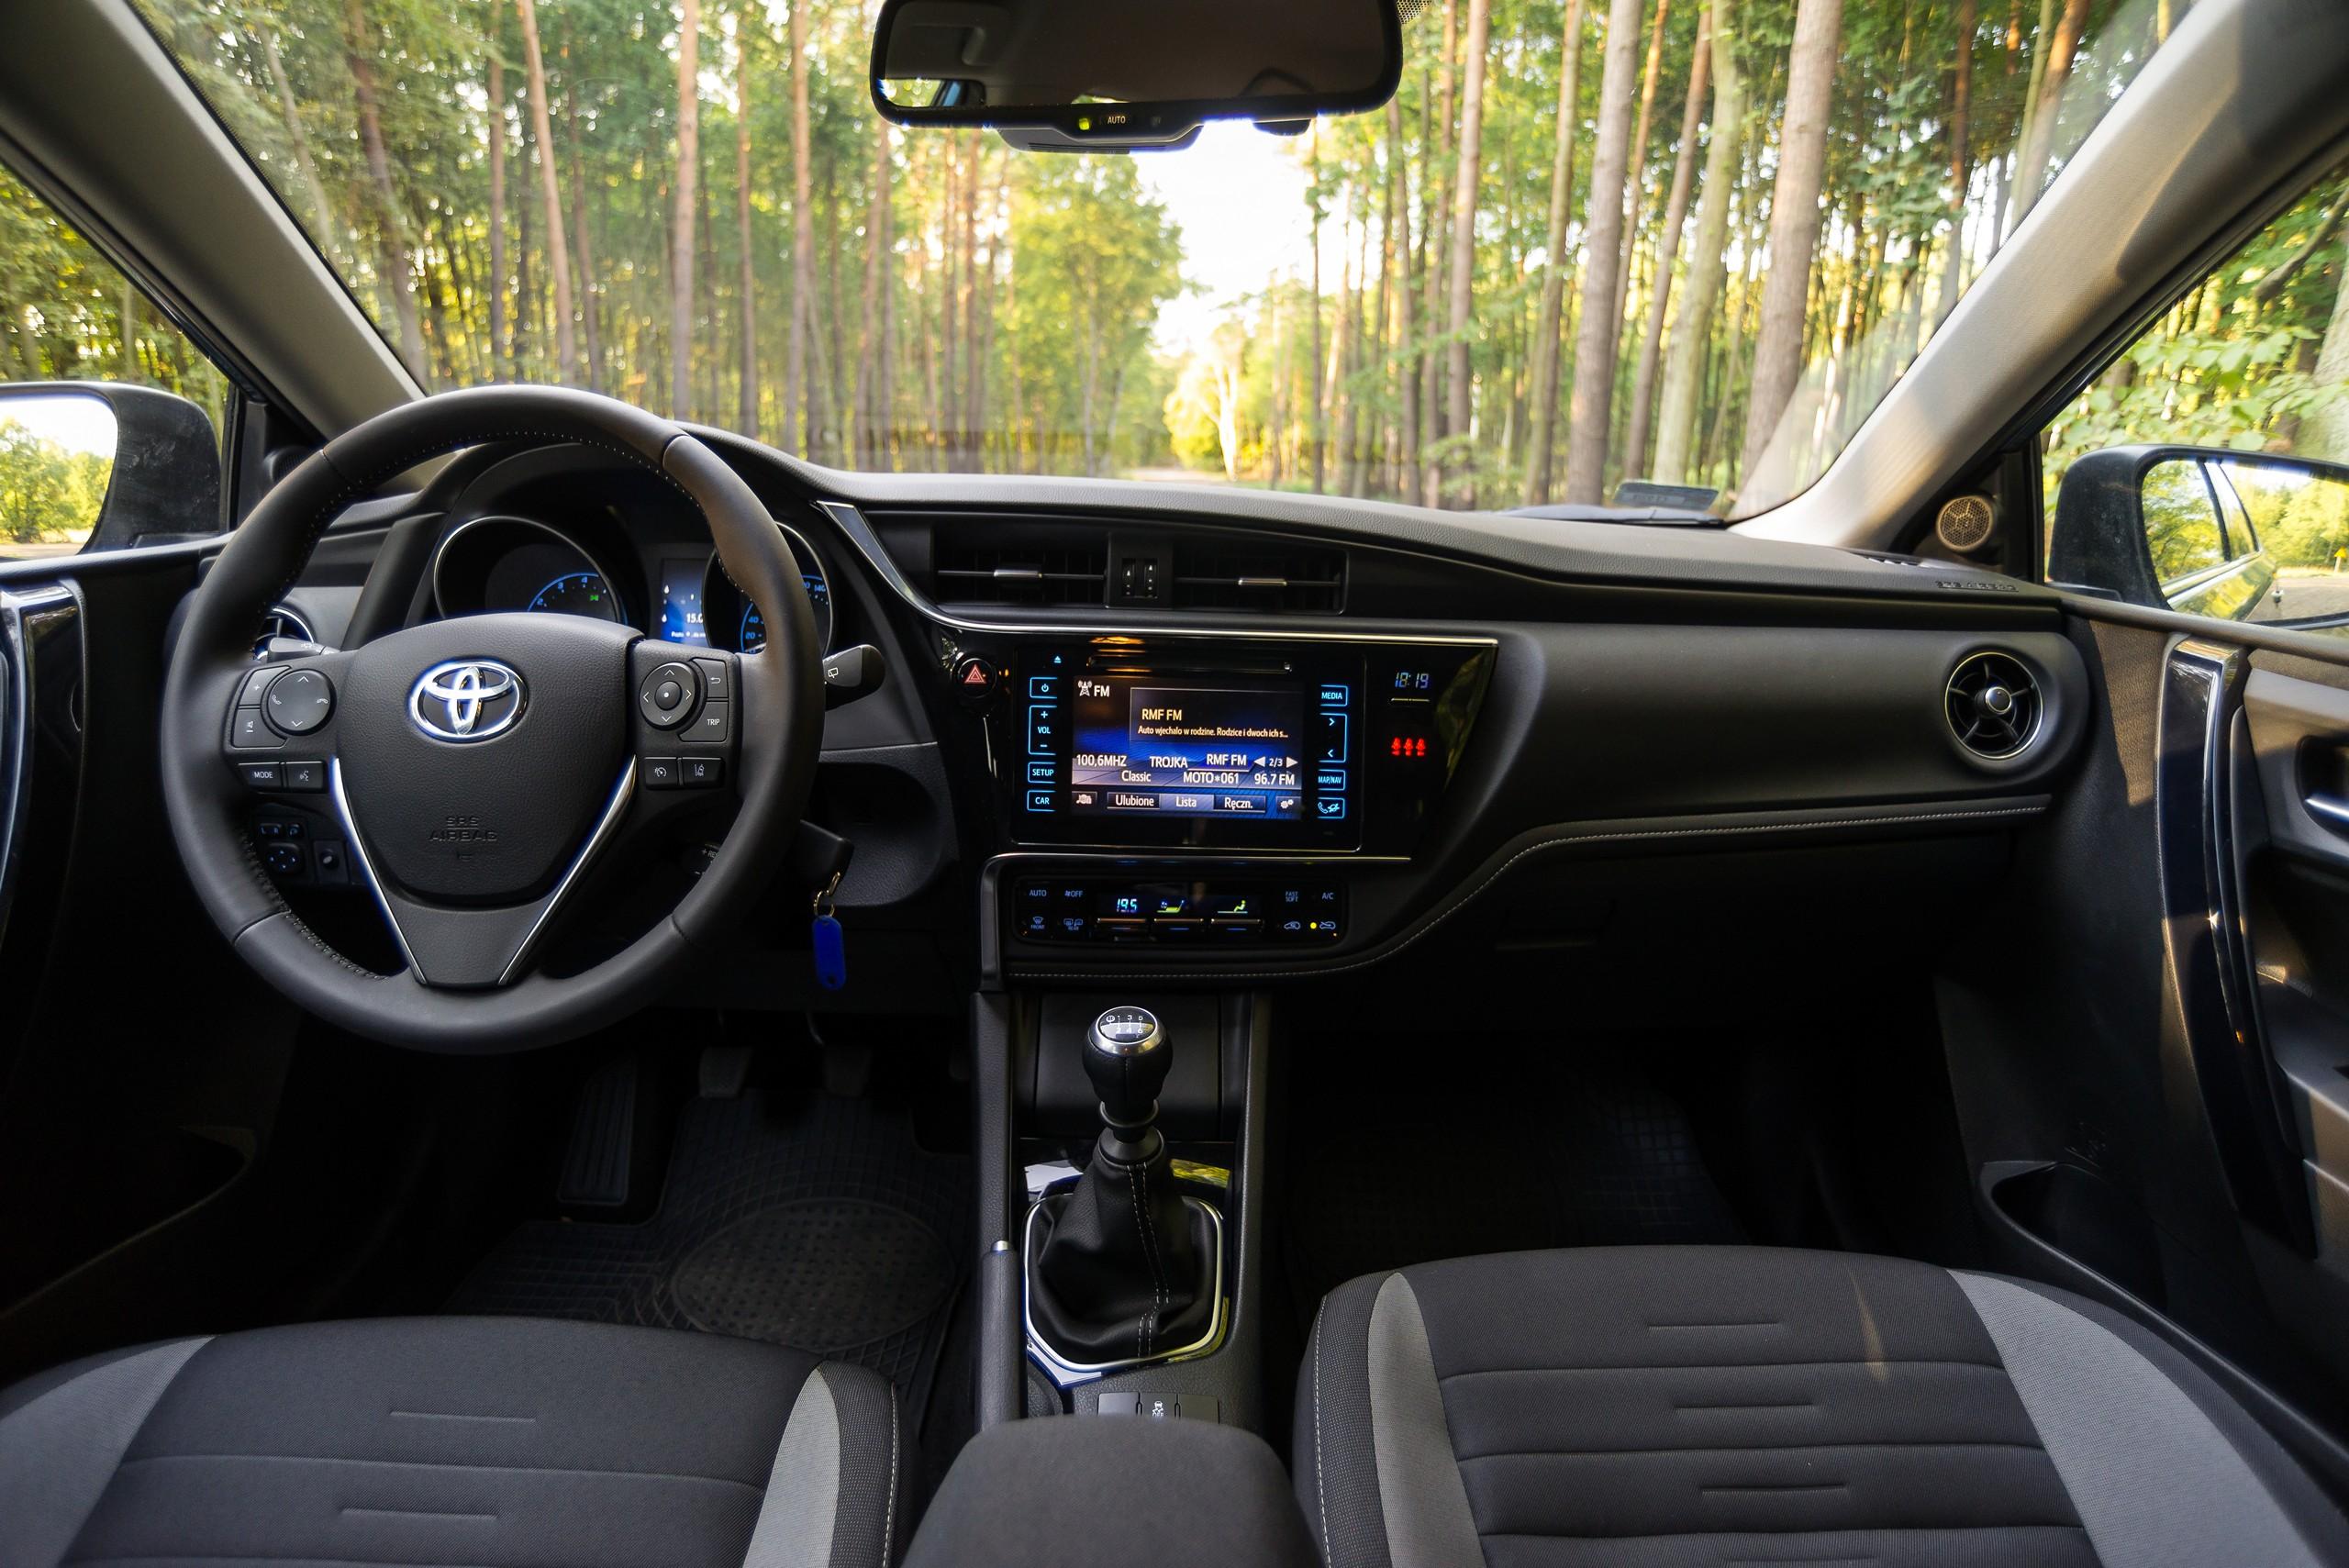 toyota auris 1 2t 116 km comfort test project automotive. Black Bedroom Furniture Sets. Home Design Ideas